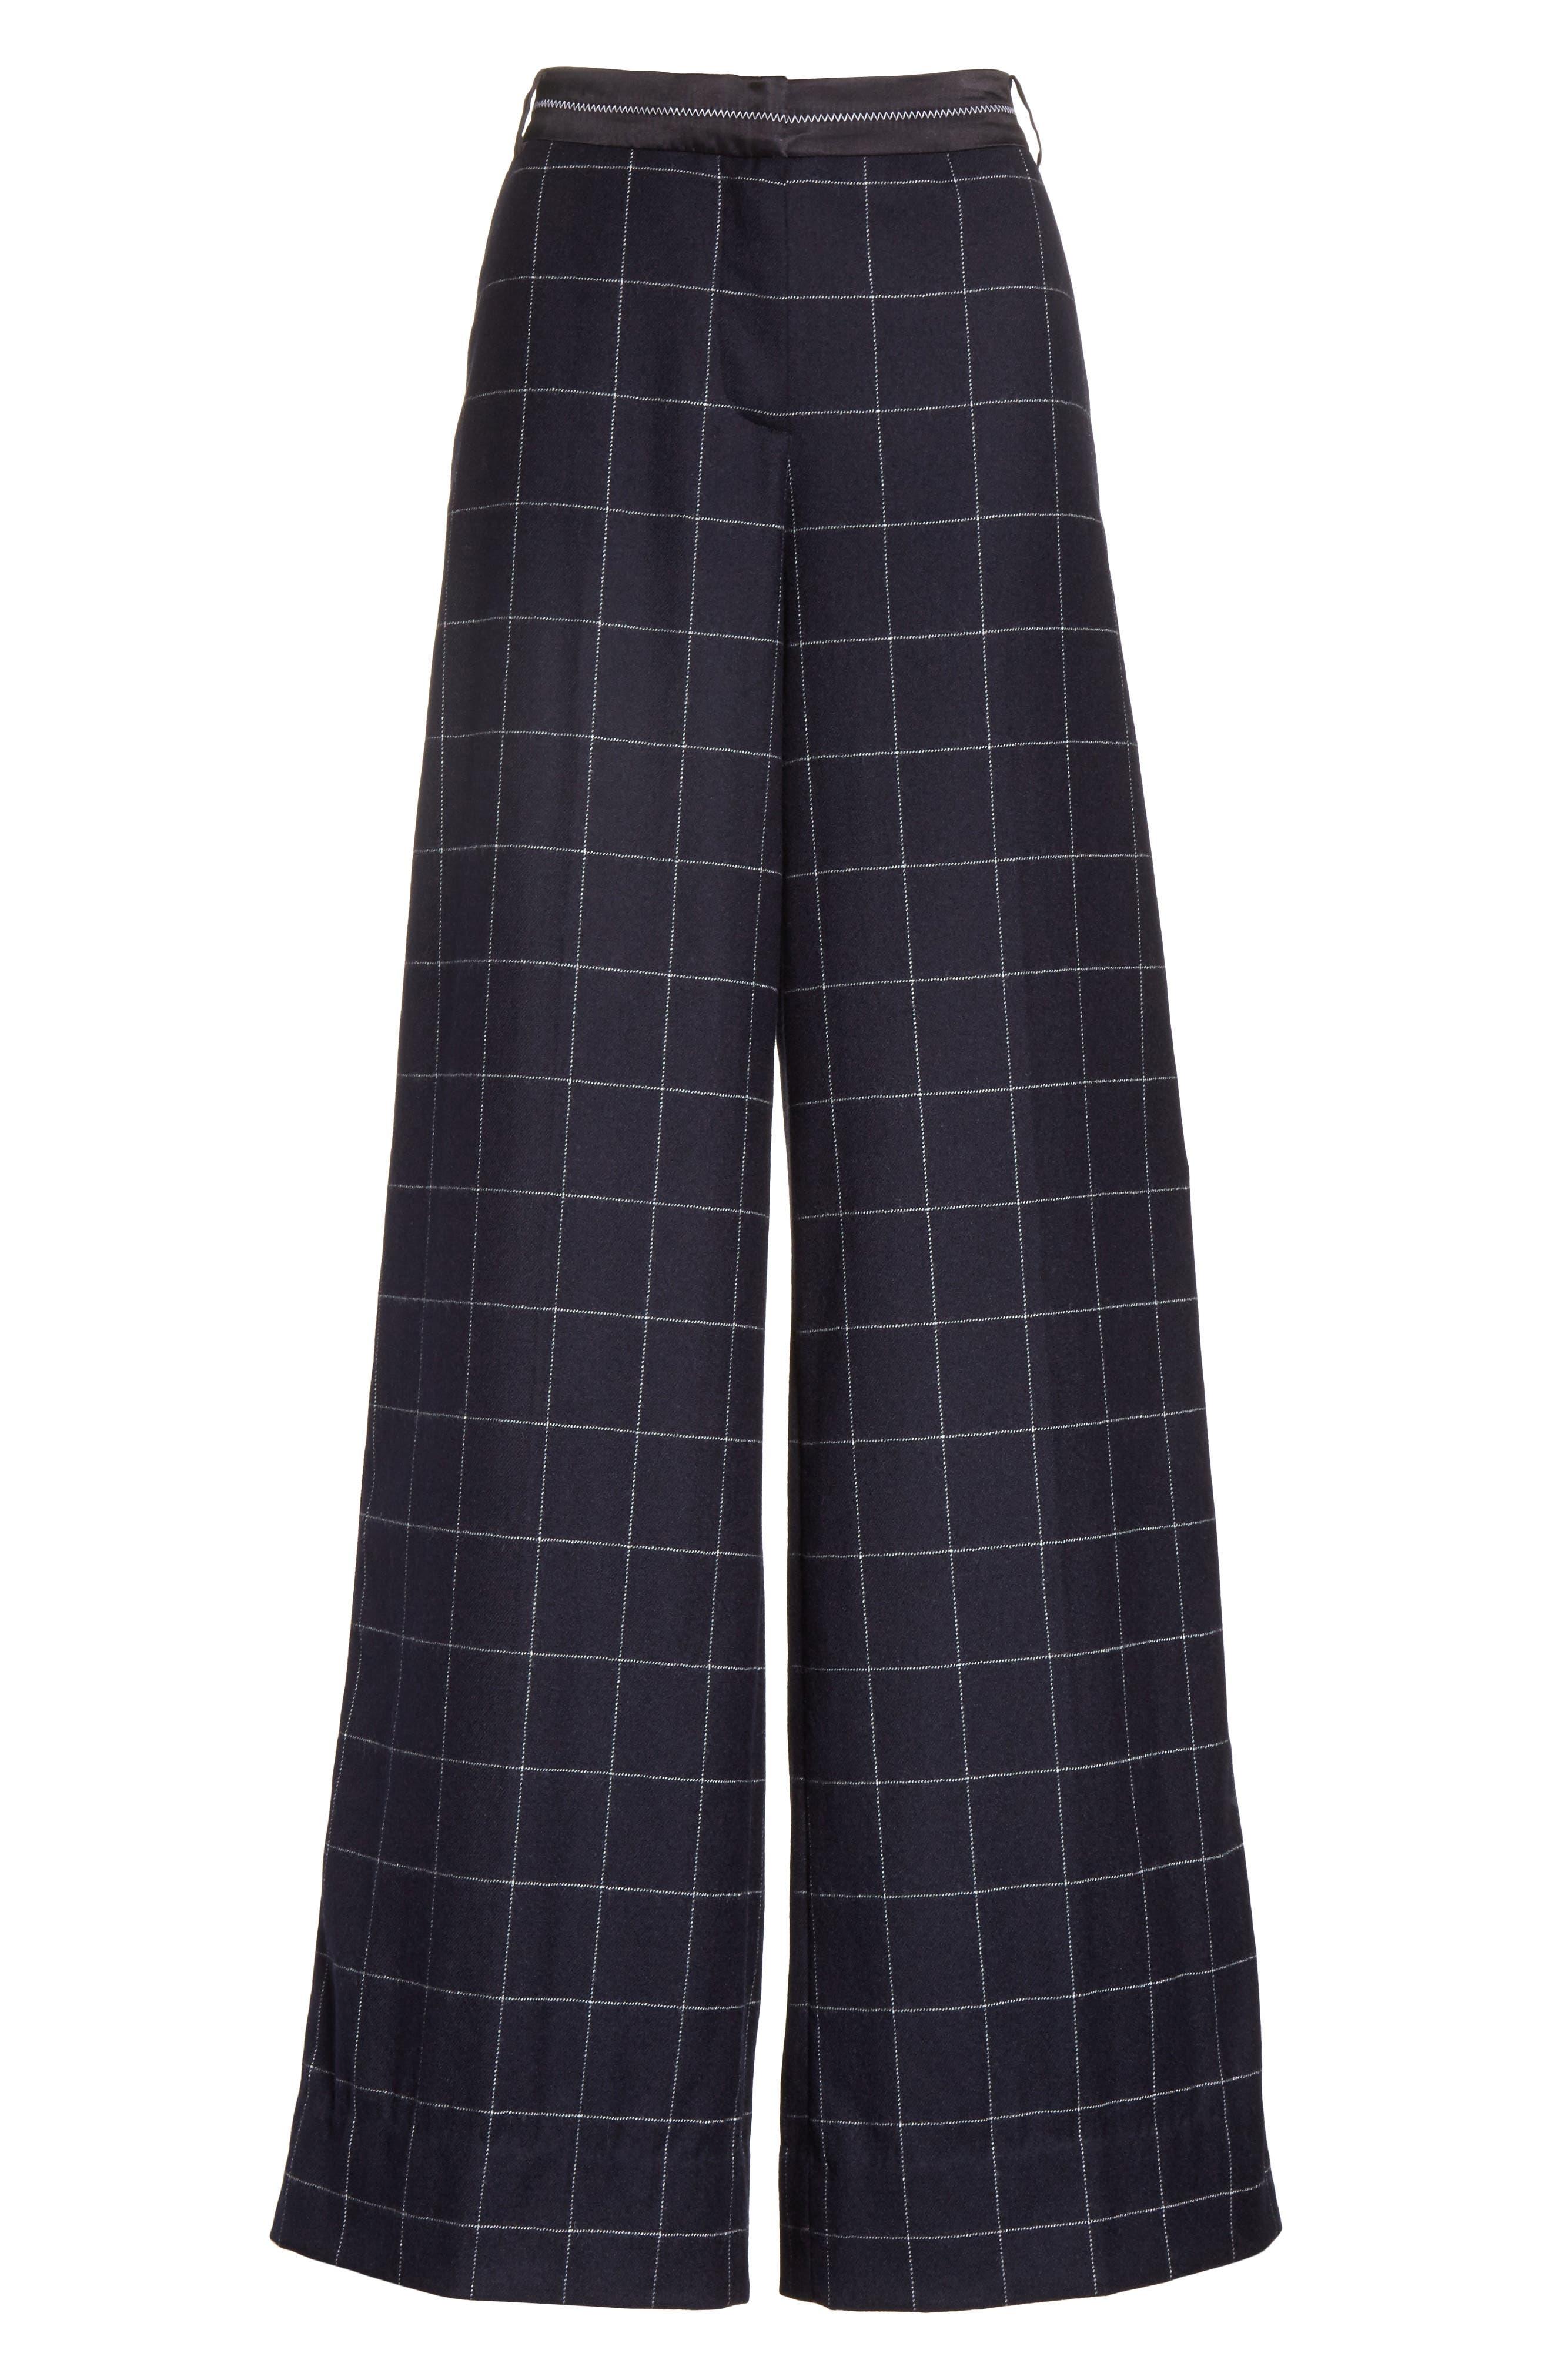 Windowpane Wool Blend Wide Leg Pants,                             Alternate thumbnail 6, color,                             Navy